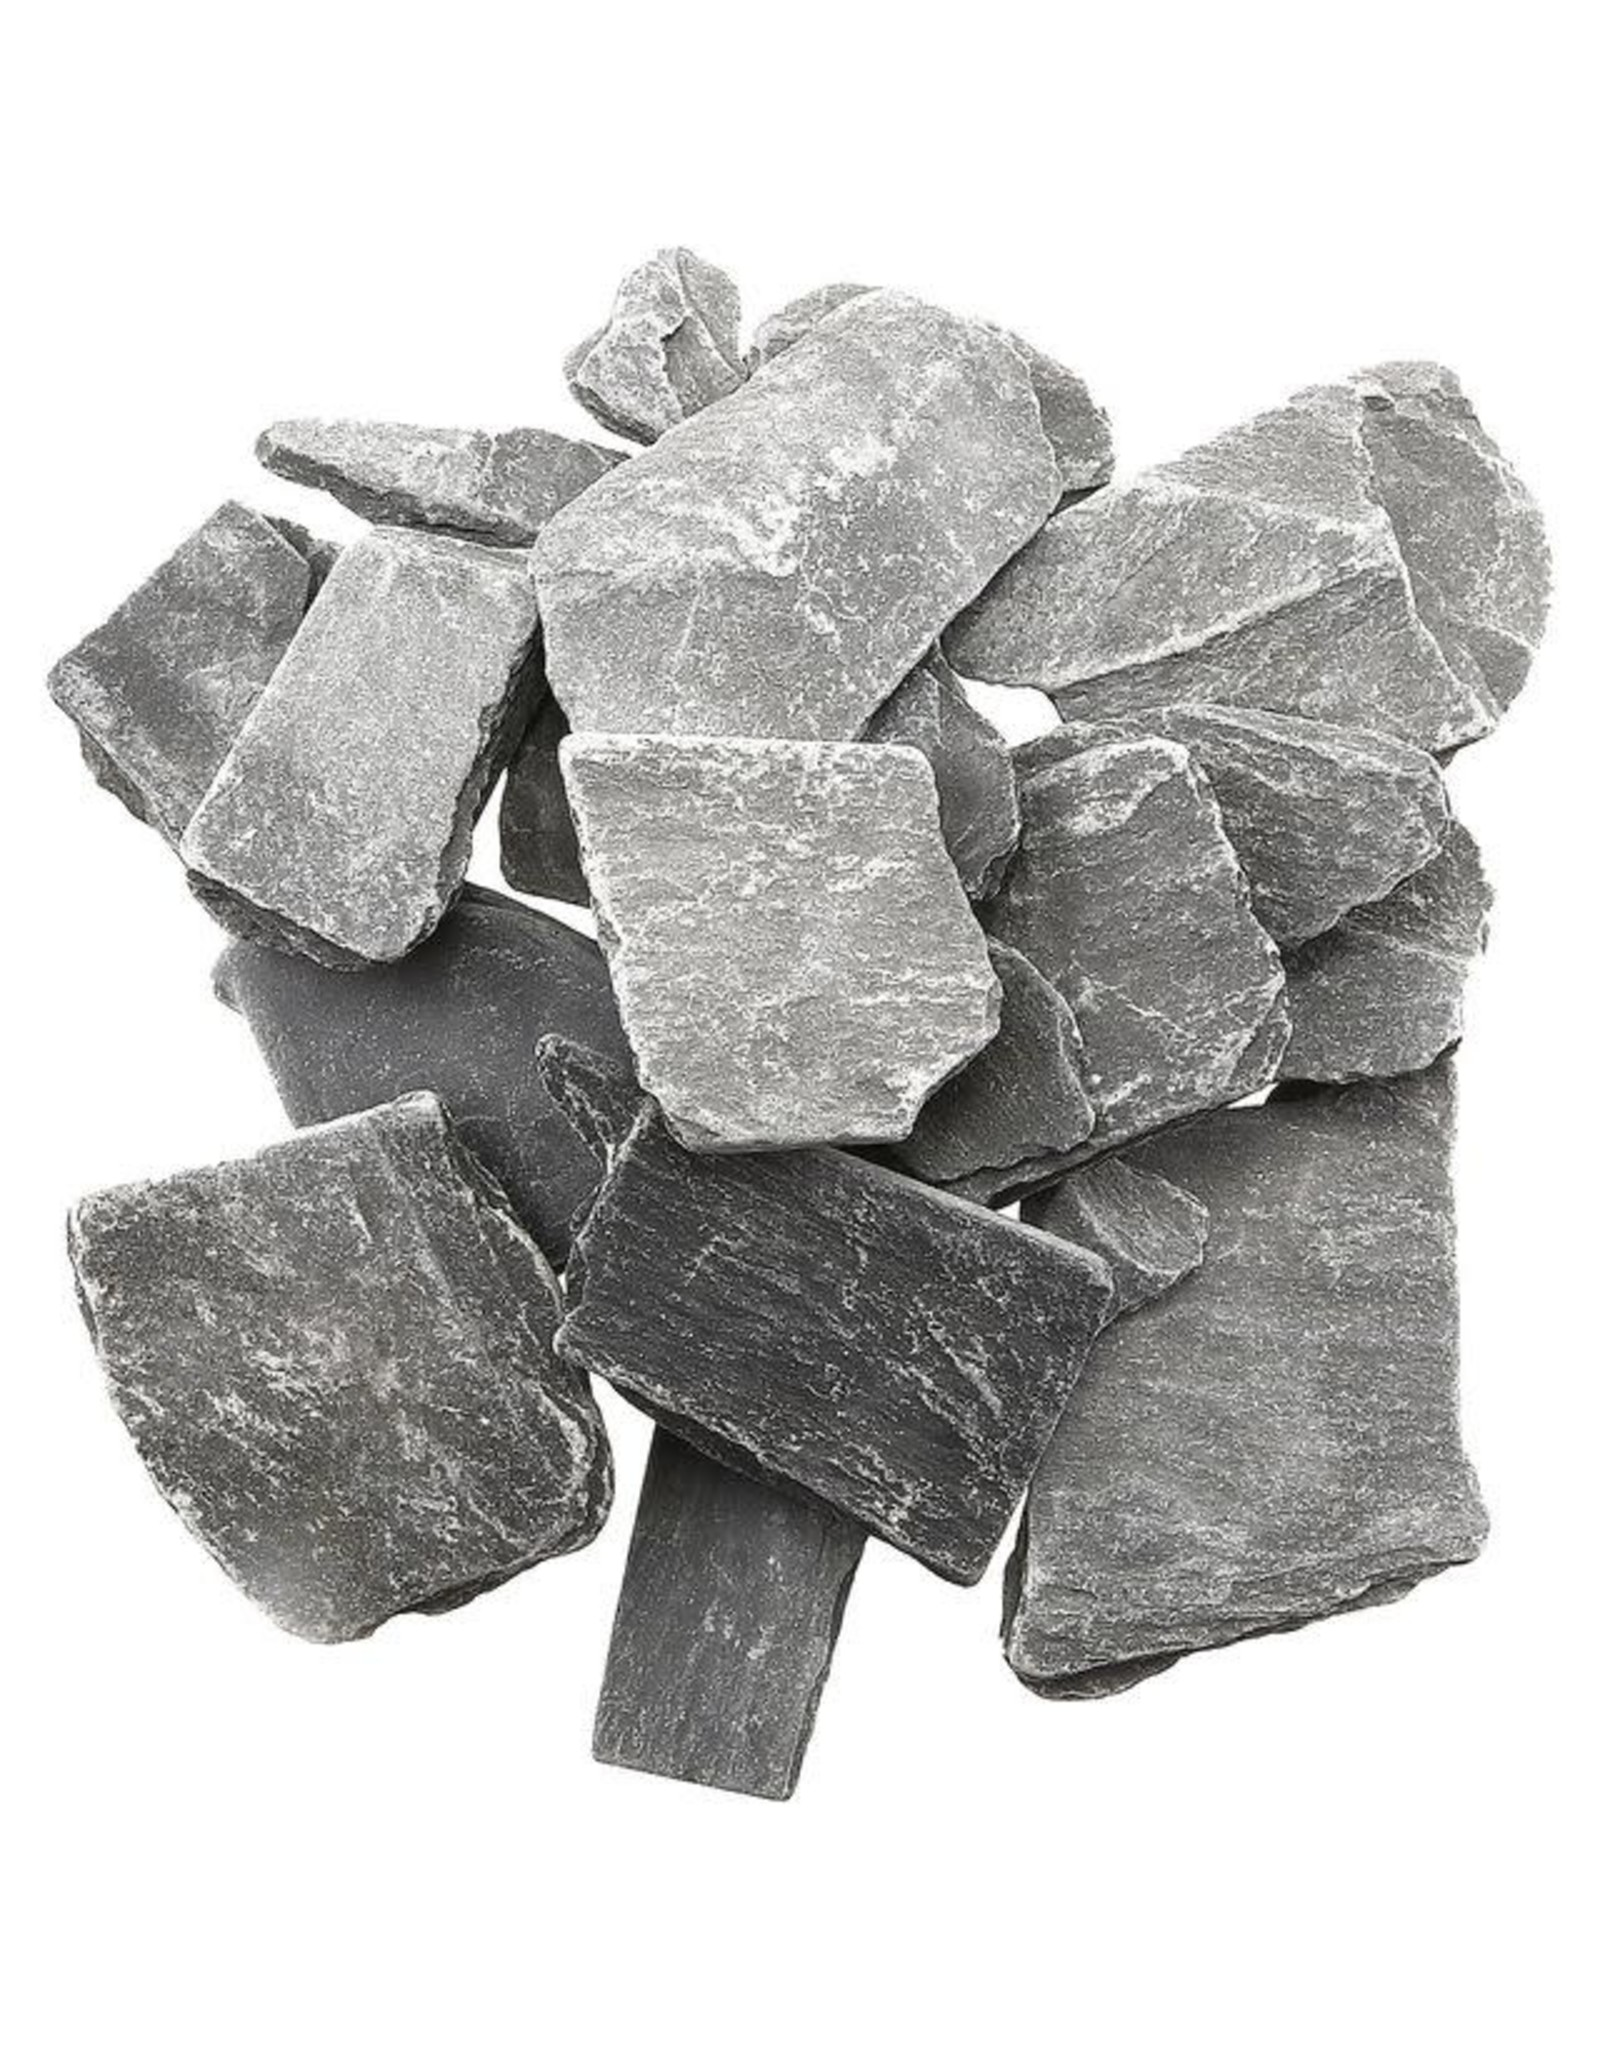 ADA ADA Riccia Stone 10 pieces